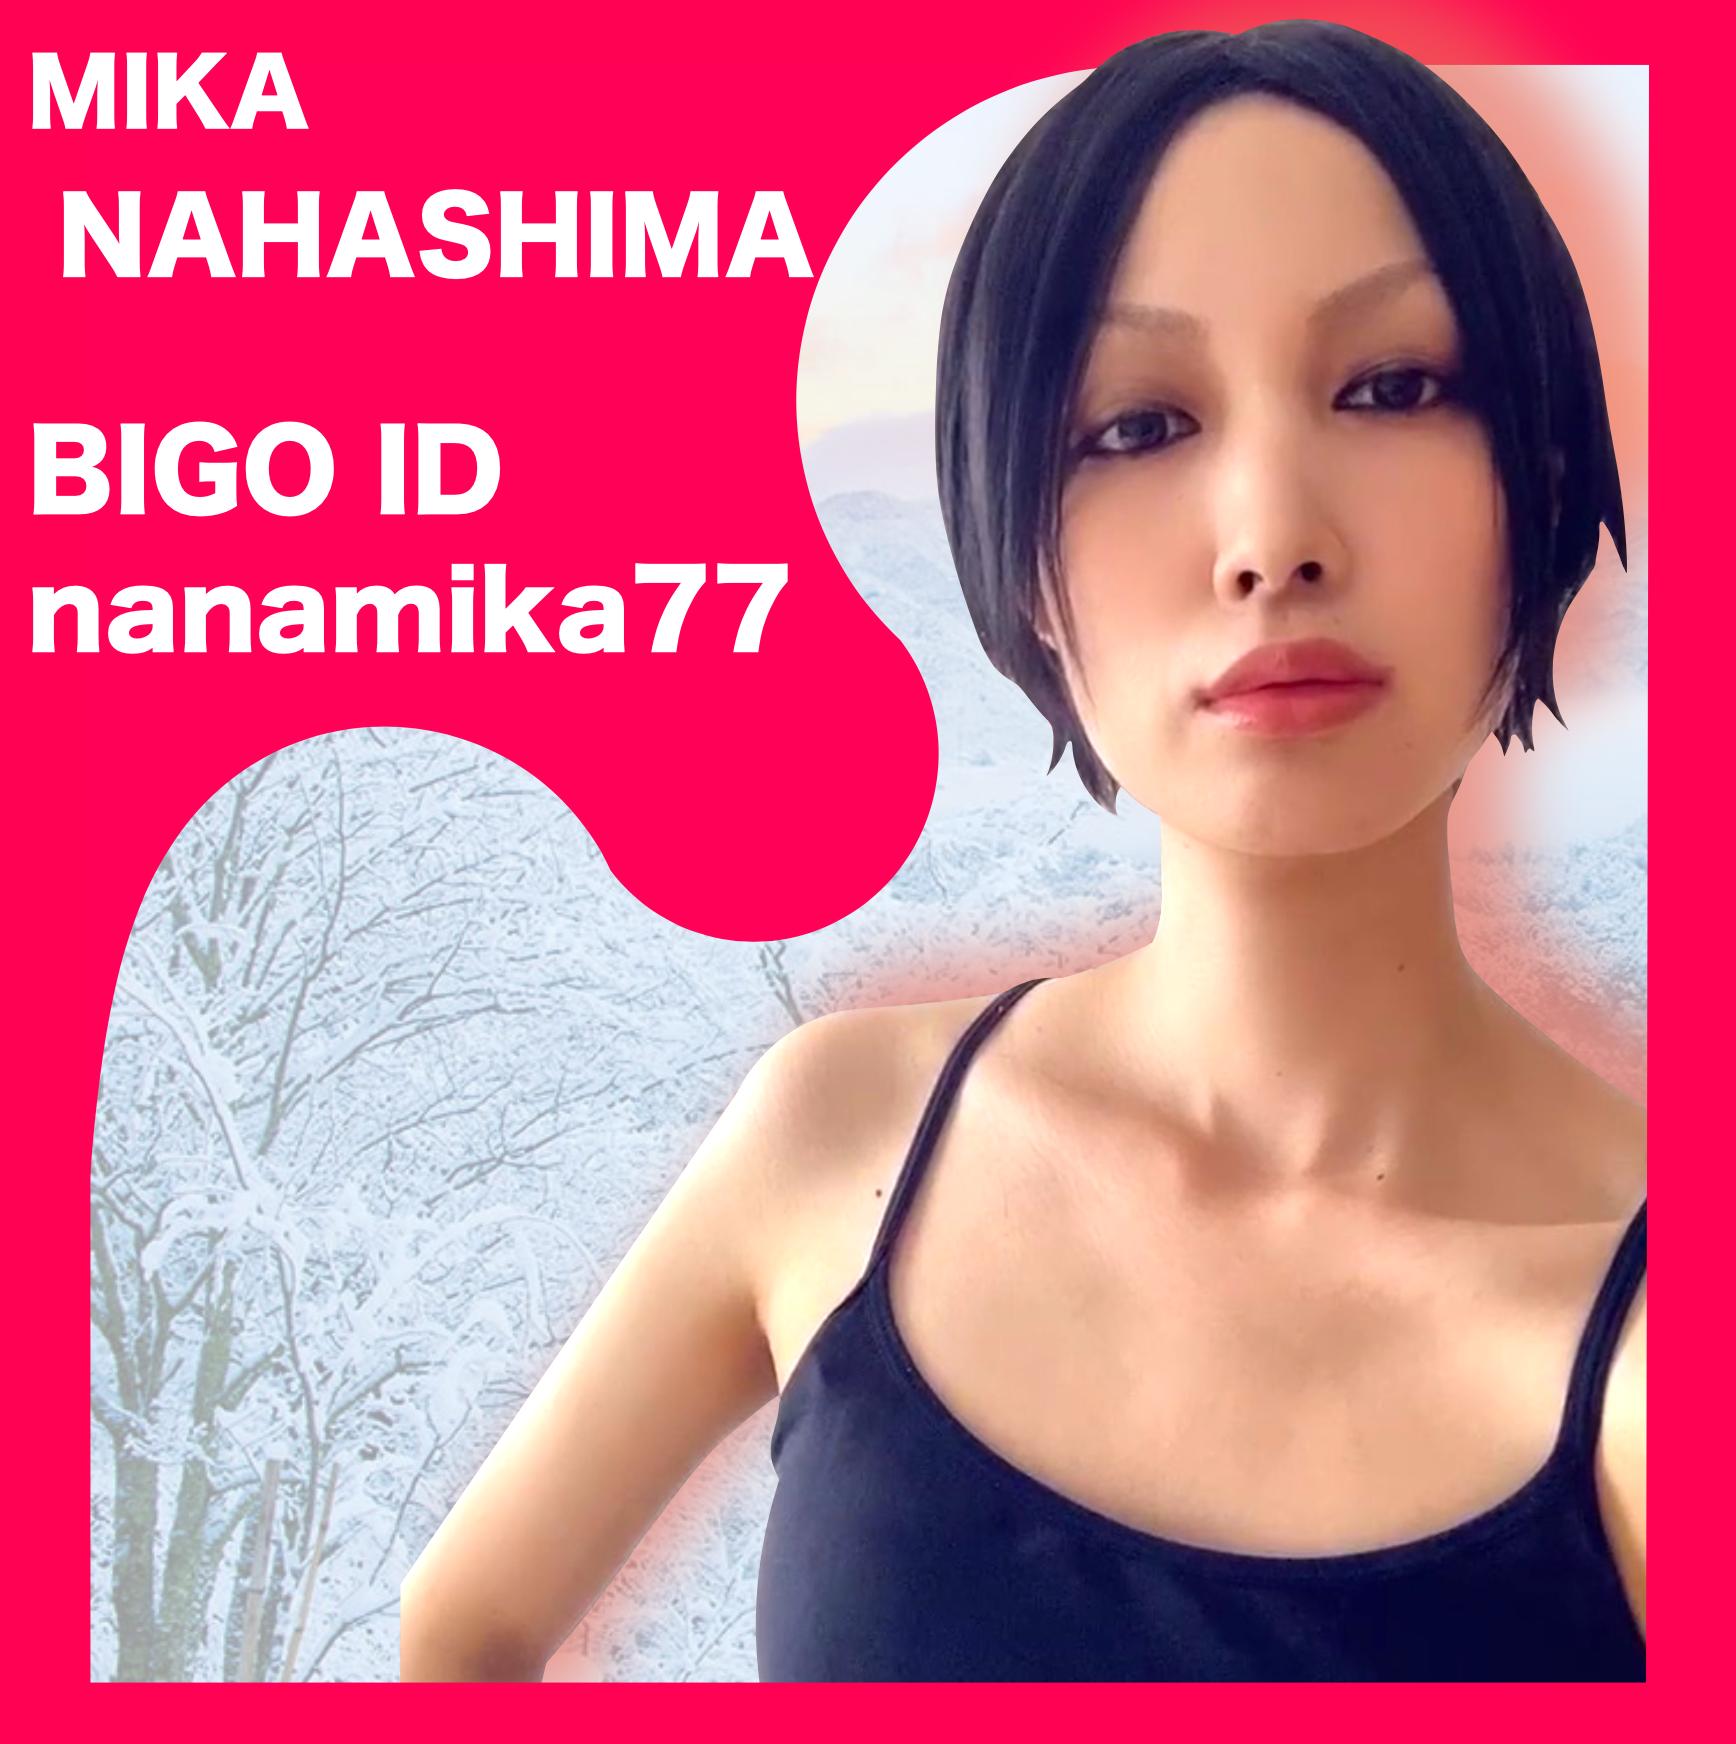 MIKA NAHASHIMA